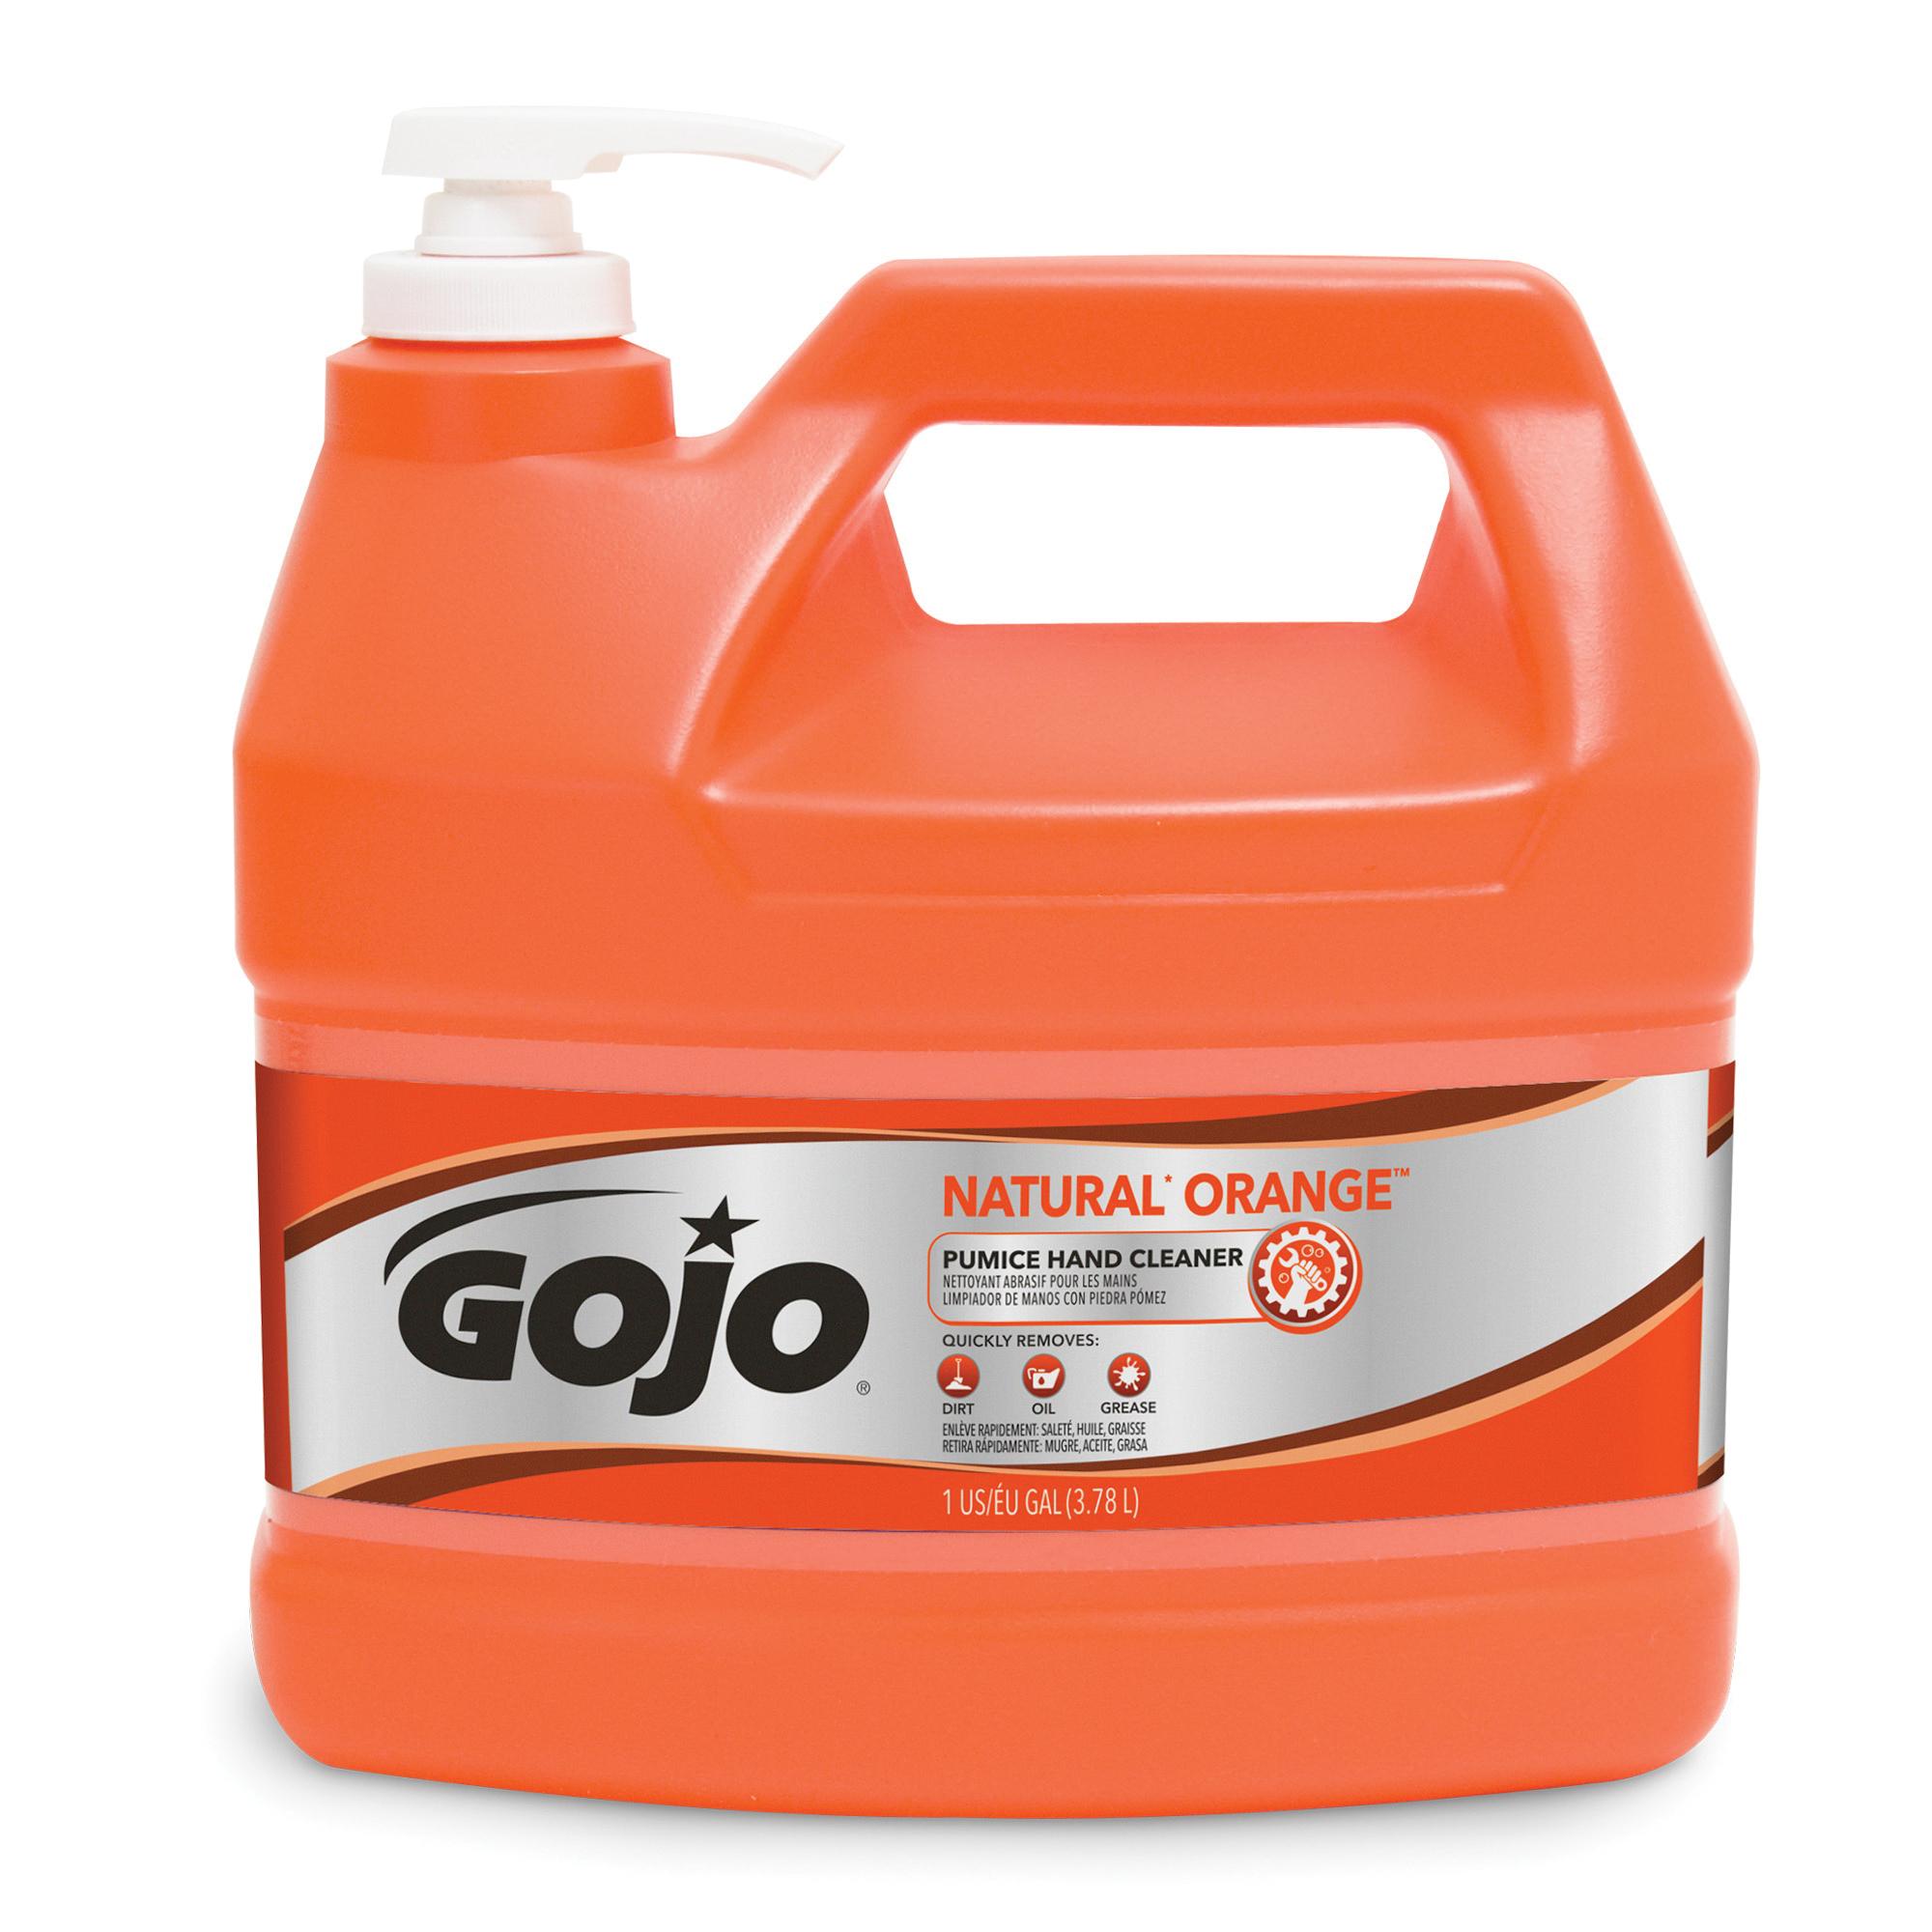 GOJO® 0955-02 NATURAL ORANGE™ Pumice Hand Cleaner, 1 gal Nominal, Pump Bottle Package, Liquid Form, Citrus Odor/Scent, White, Case of 2